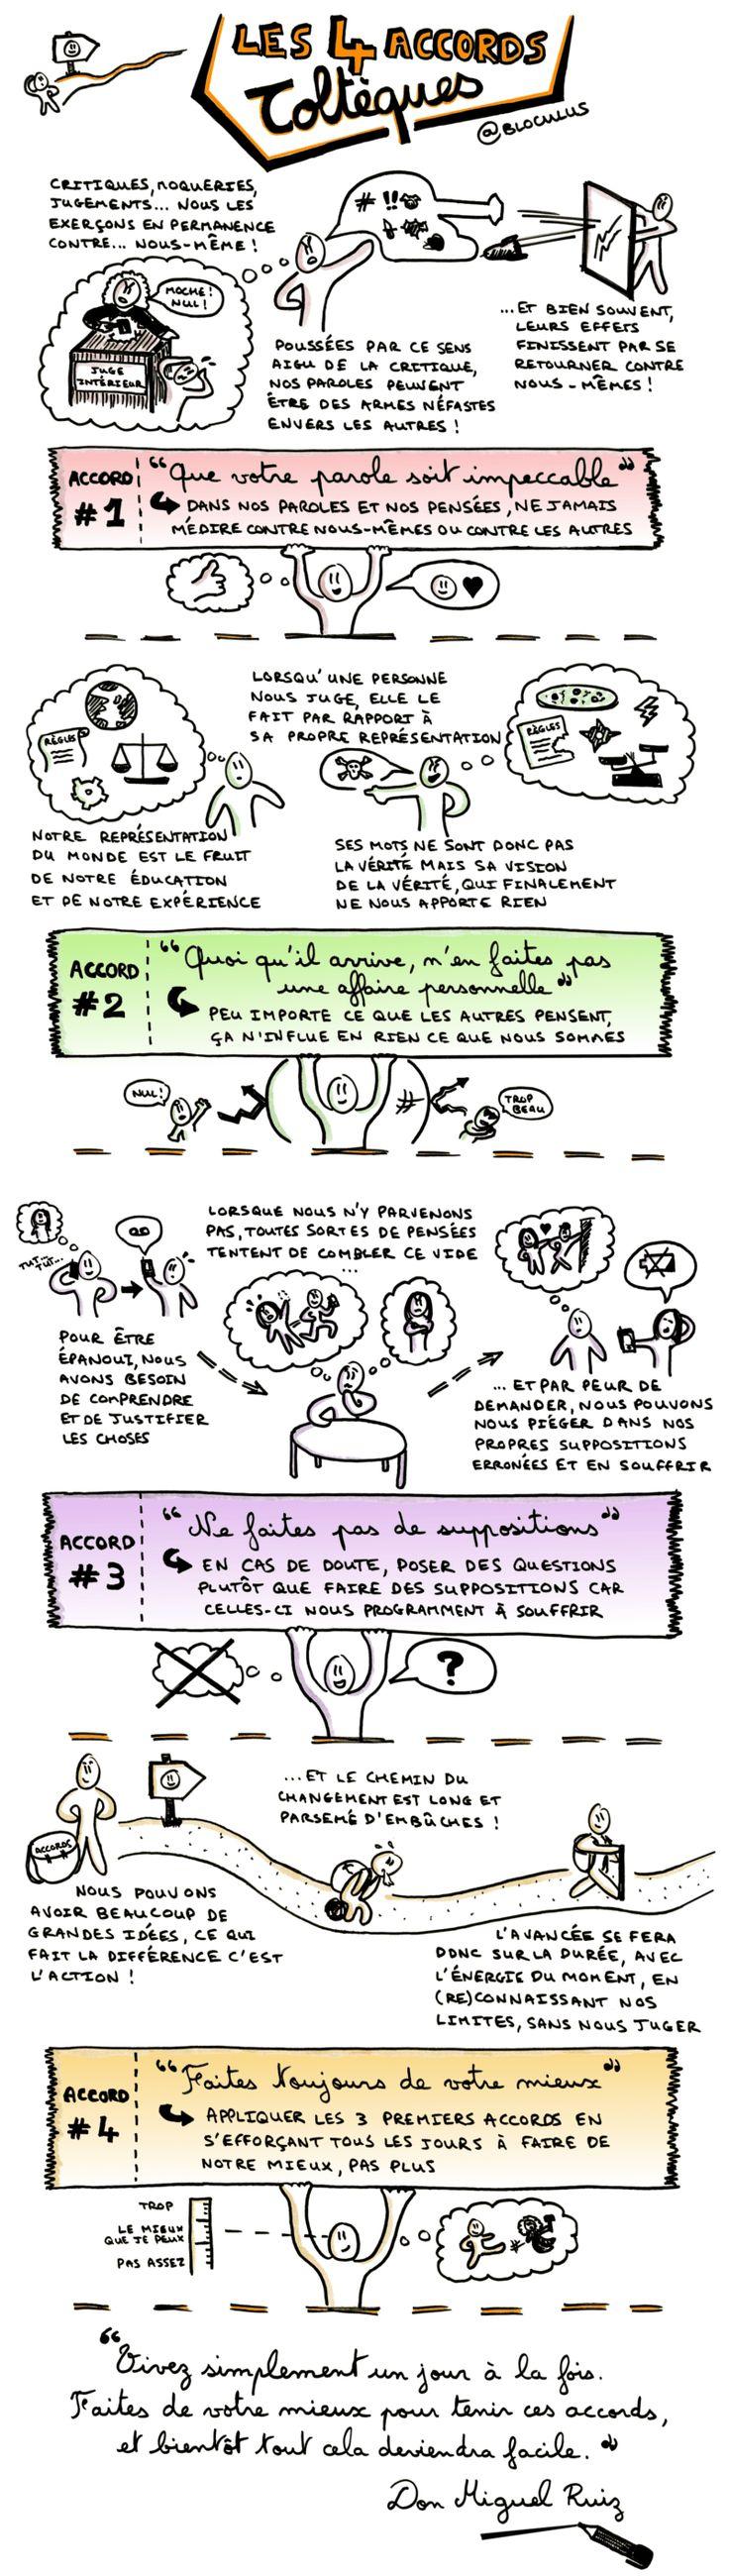 Sketchnote 4 accords Toltèques